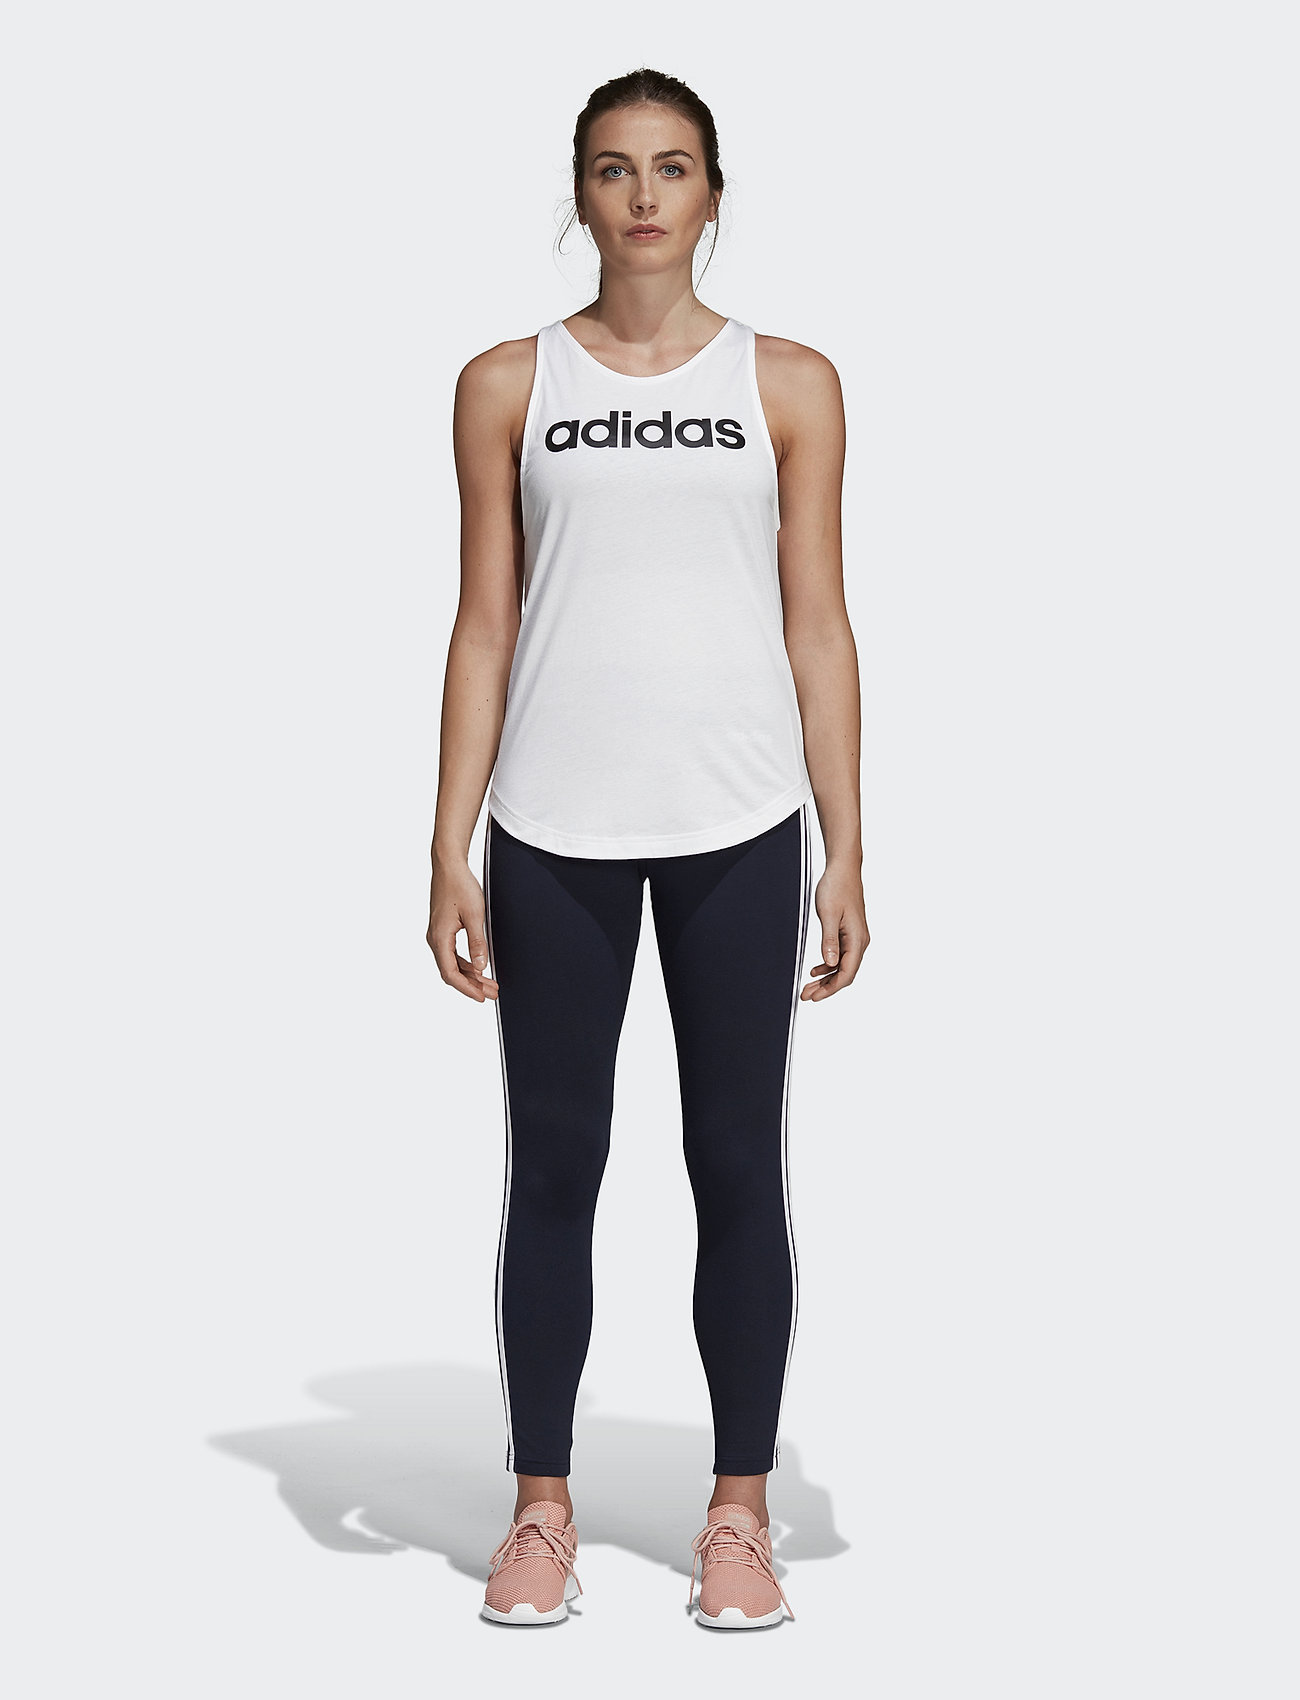 adidas Performance - Essentials Linear Tank Top W - topjes - white/black - 0